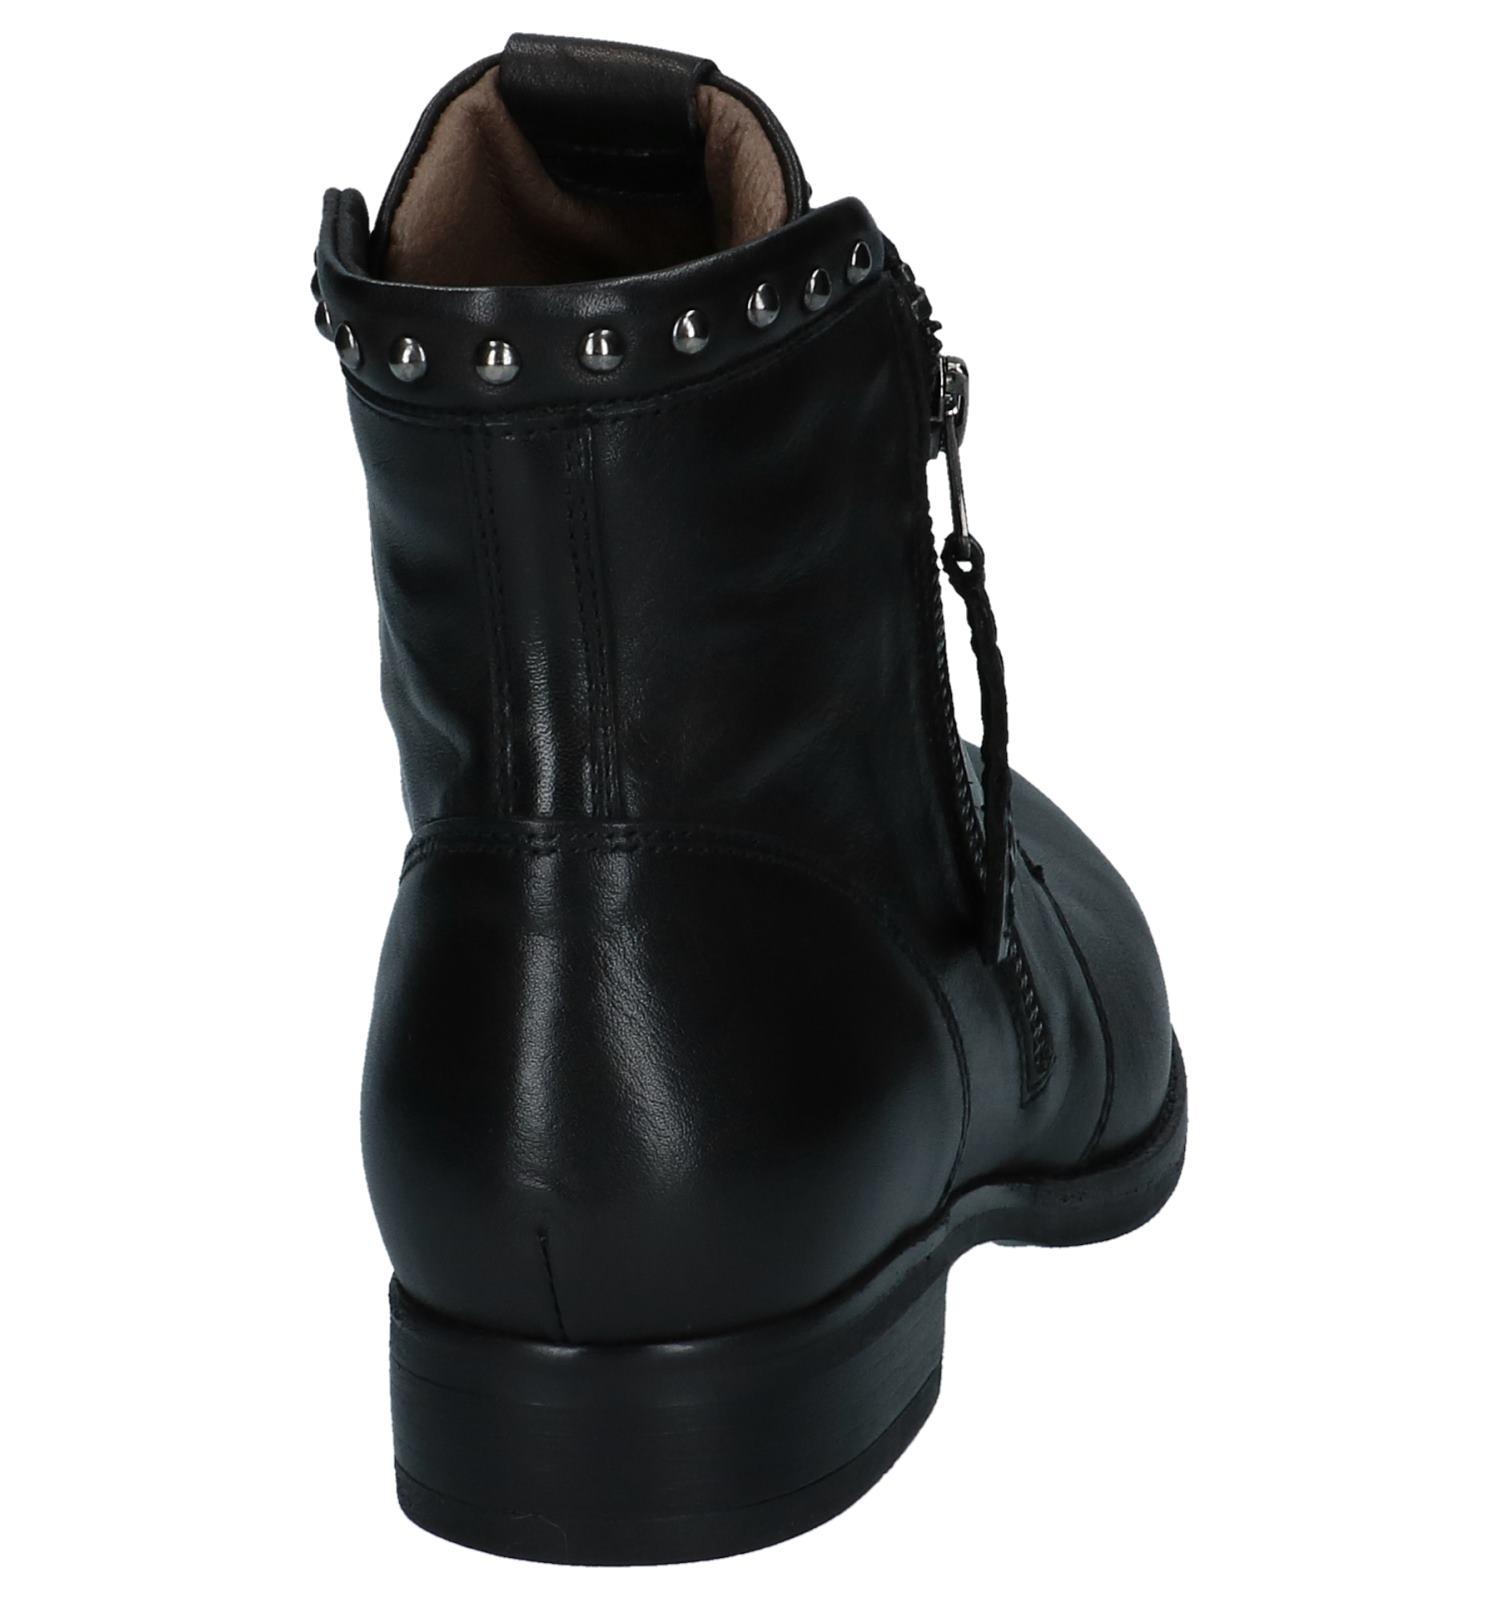 Nerogiardini Boots veter Zwarte Rits Met DHIeYEW29